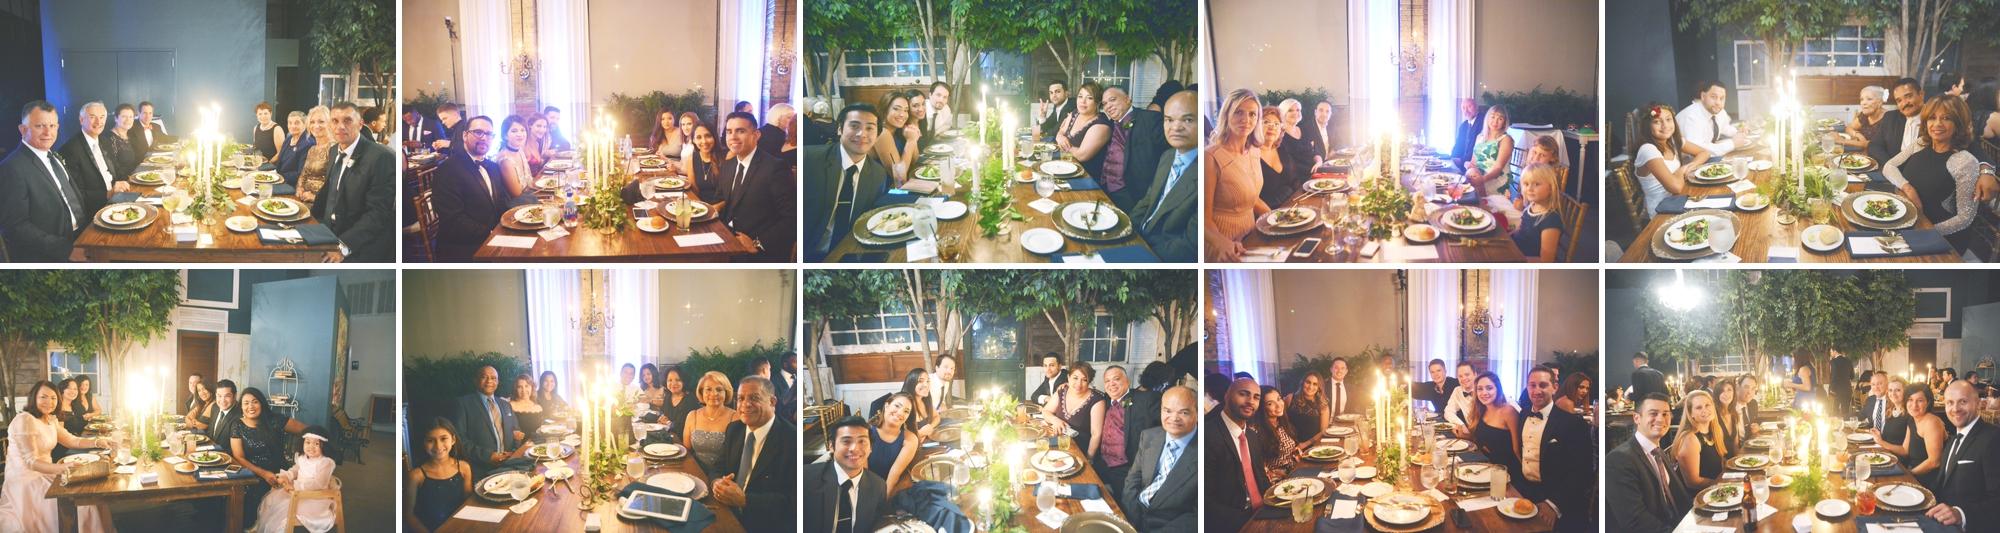 savannah-ga-harper-fowlkes-house-soho-south-cafe-wedding-six-hearts-photography072